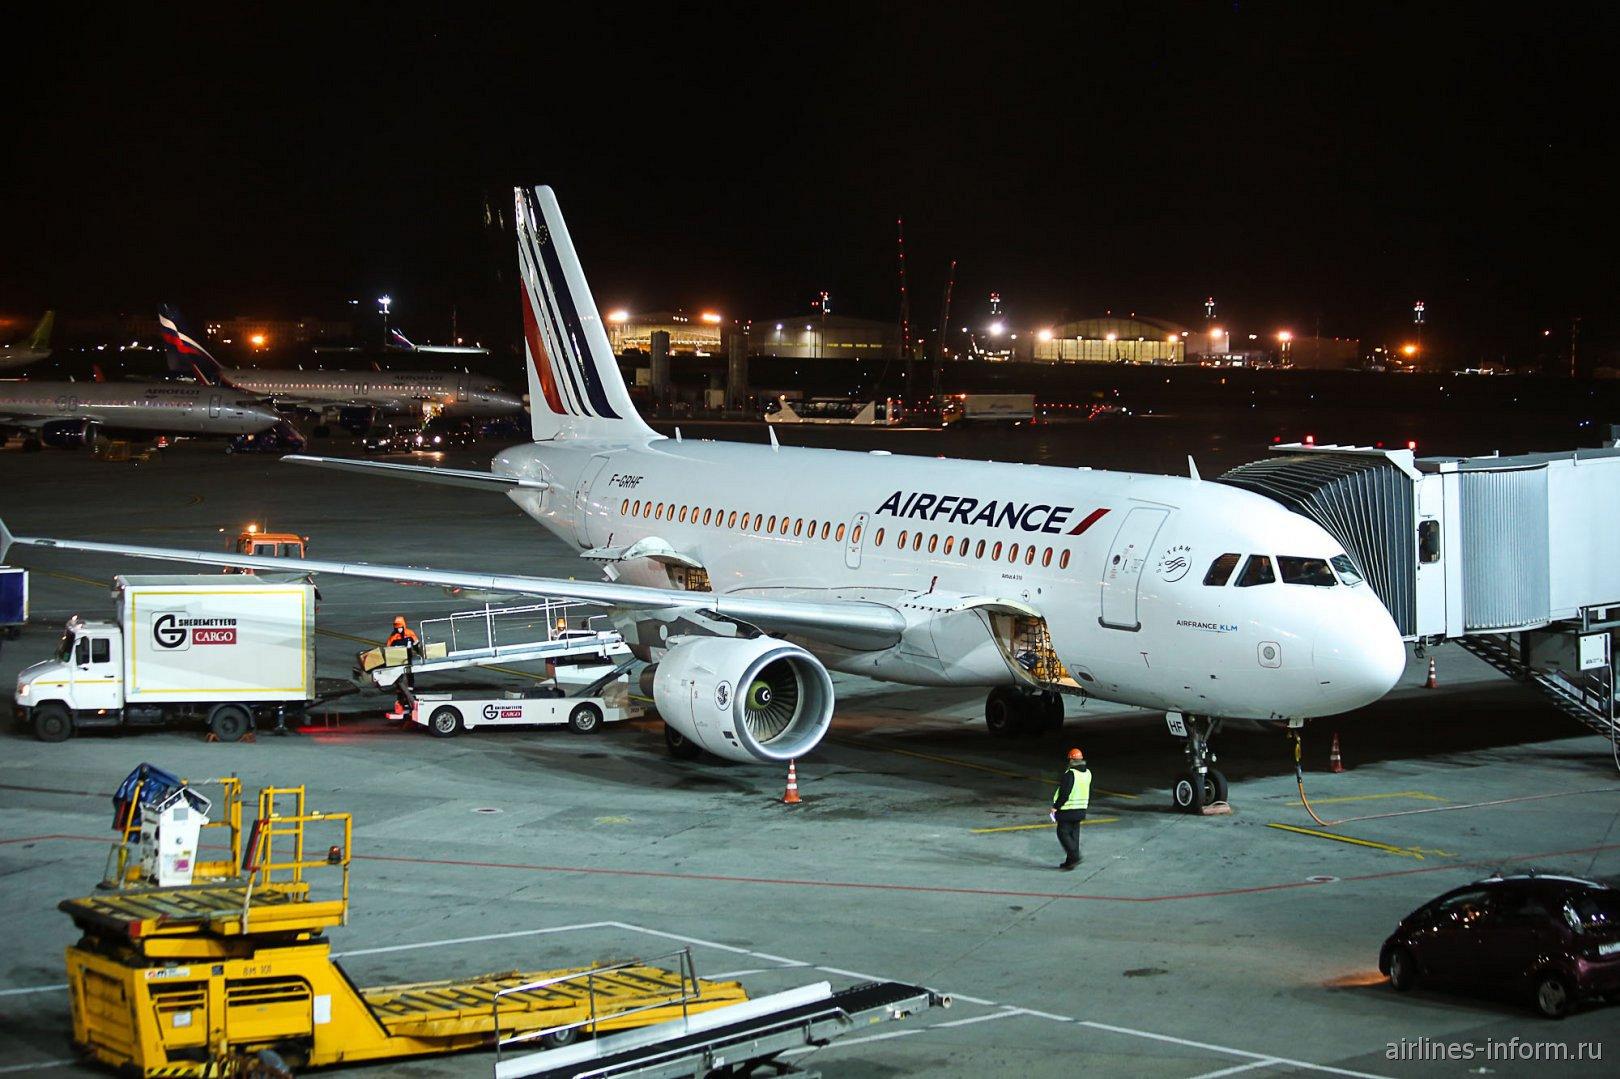 Airbus A319 F-GRHF авиакомпании Air France в аэропорту Шереметьево